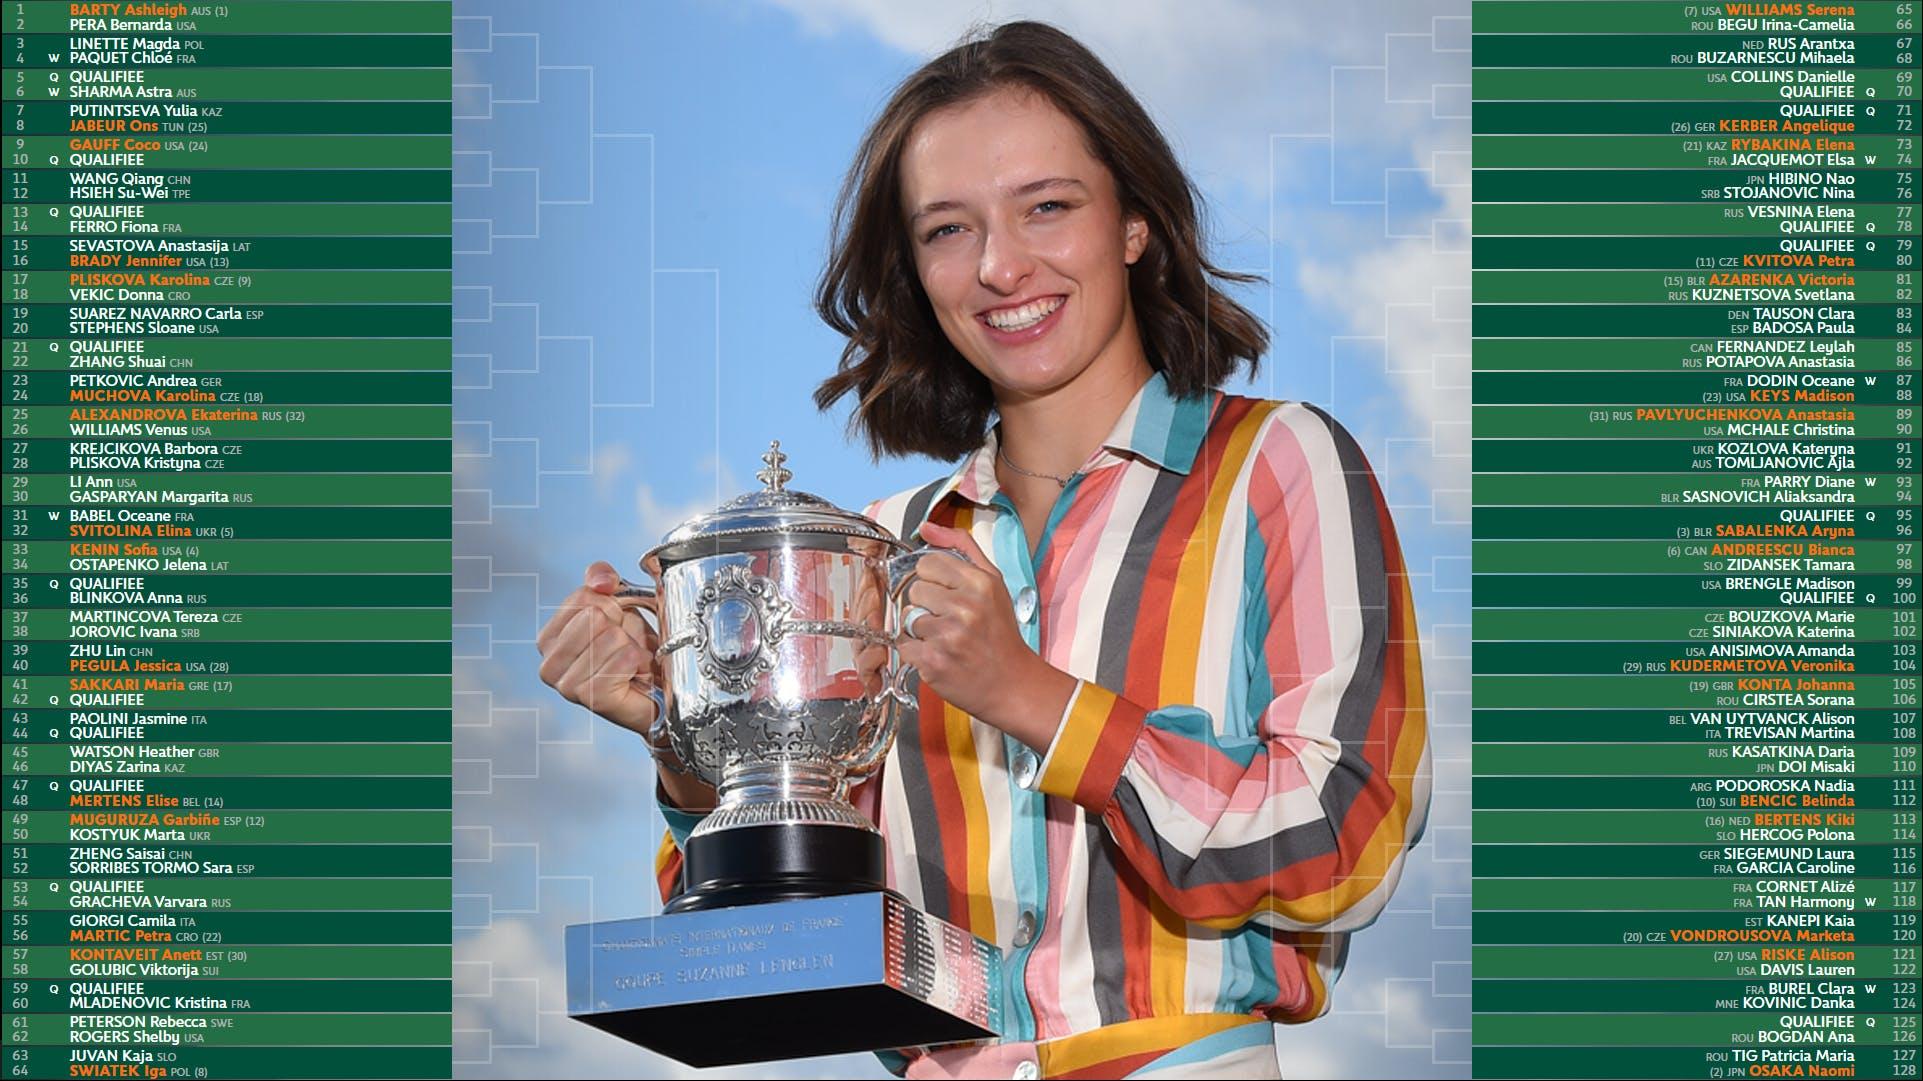 Tableau dames Roland-Garros 2021